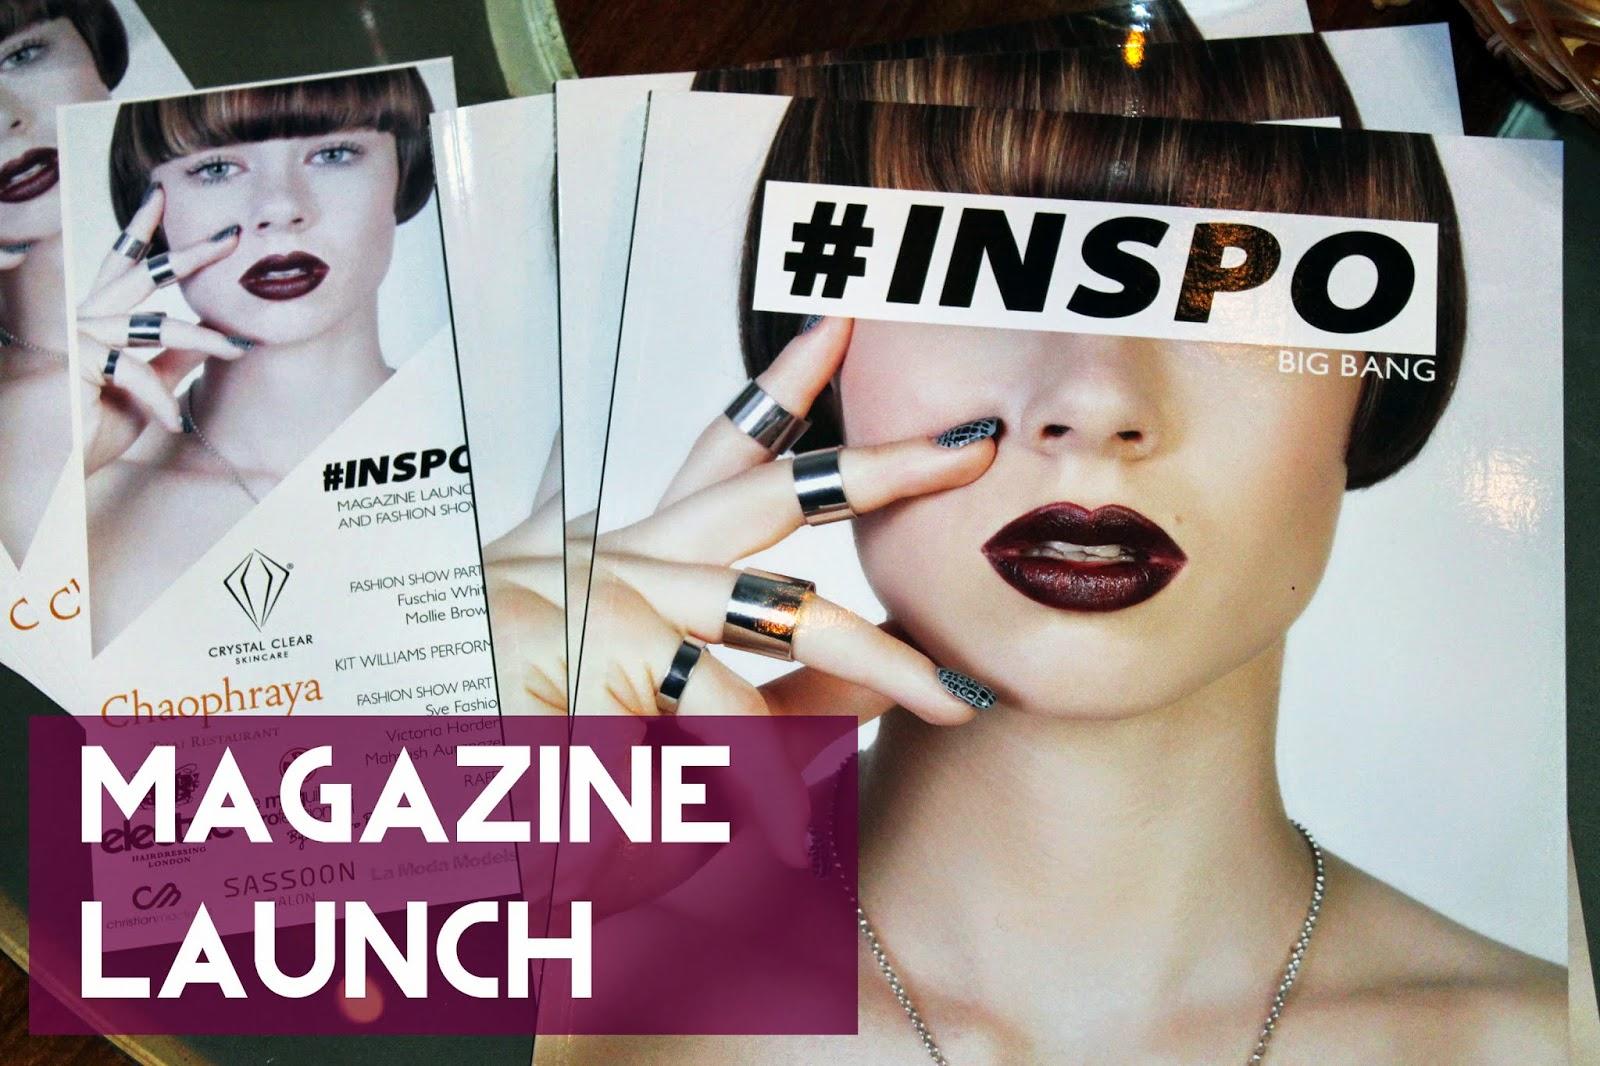 #inspo magazine launch party liverpool